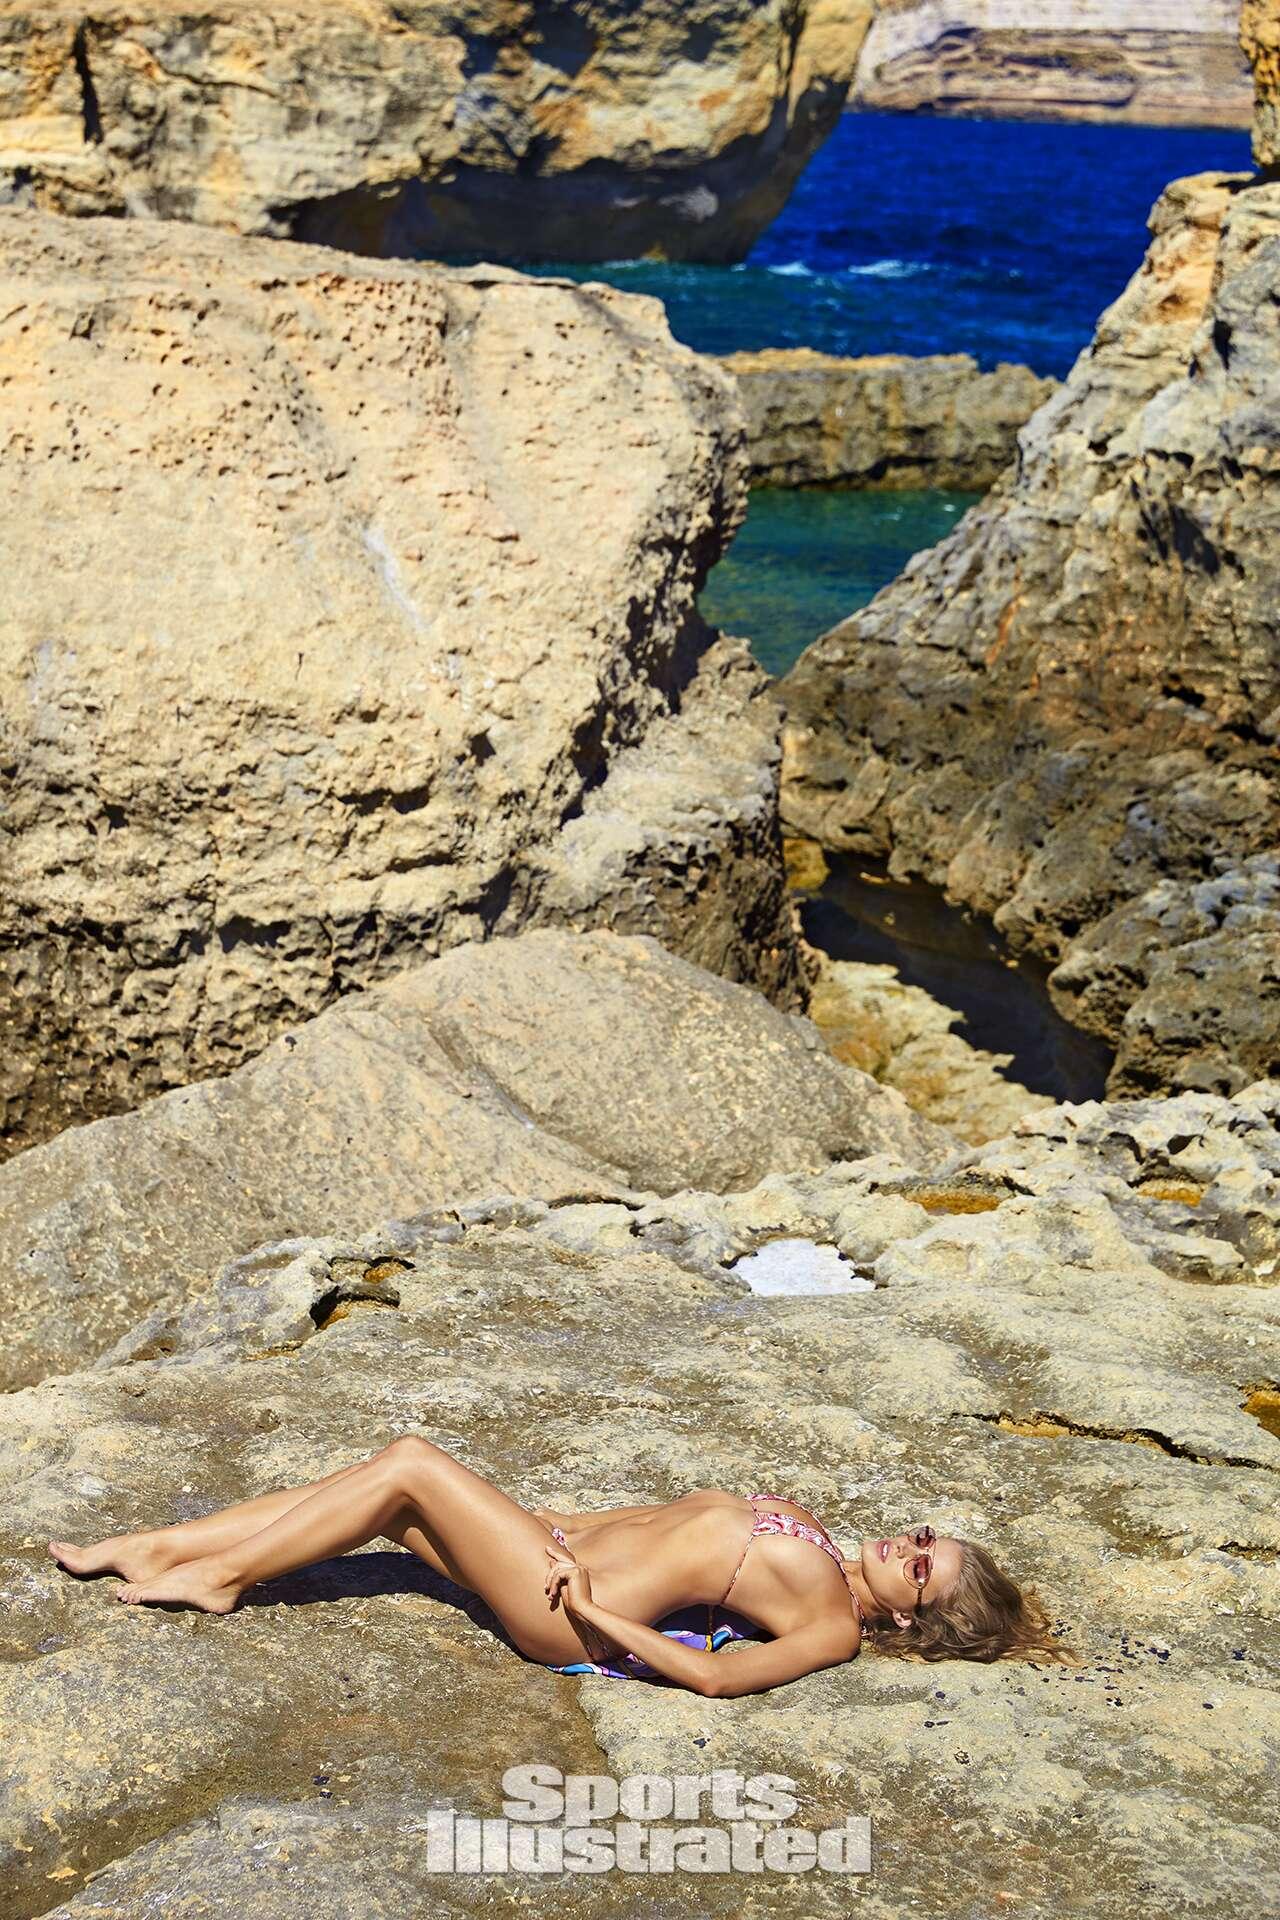 Tanya Mityushina was photographed by Ben Watts in Malta. Swimsuit by Toxic Sadie Swimwear.